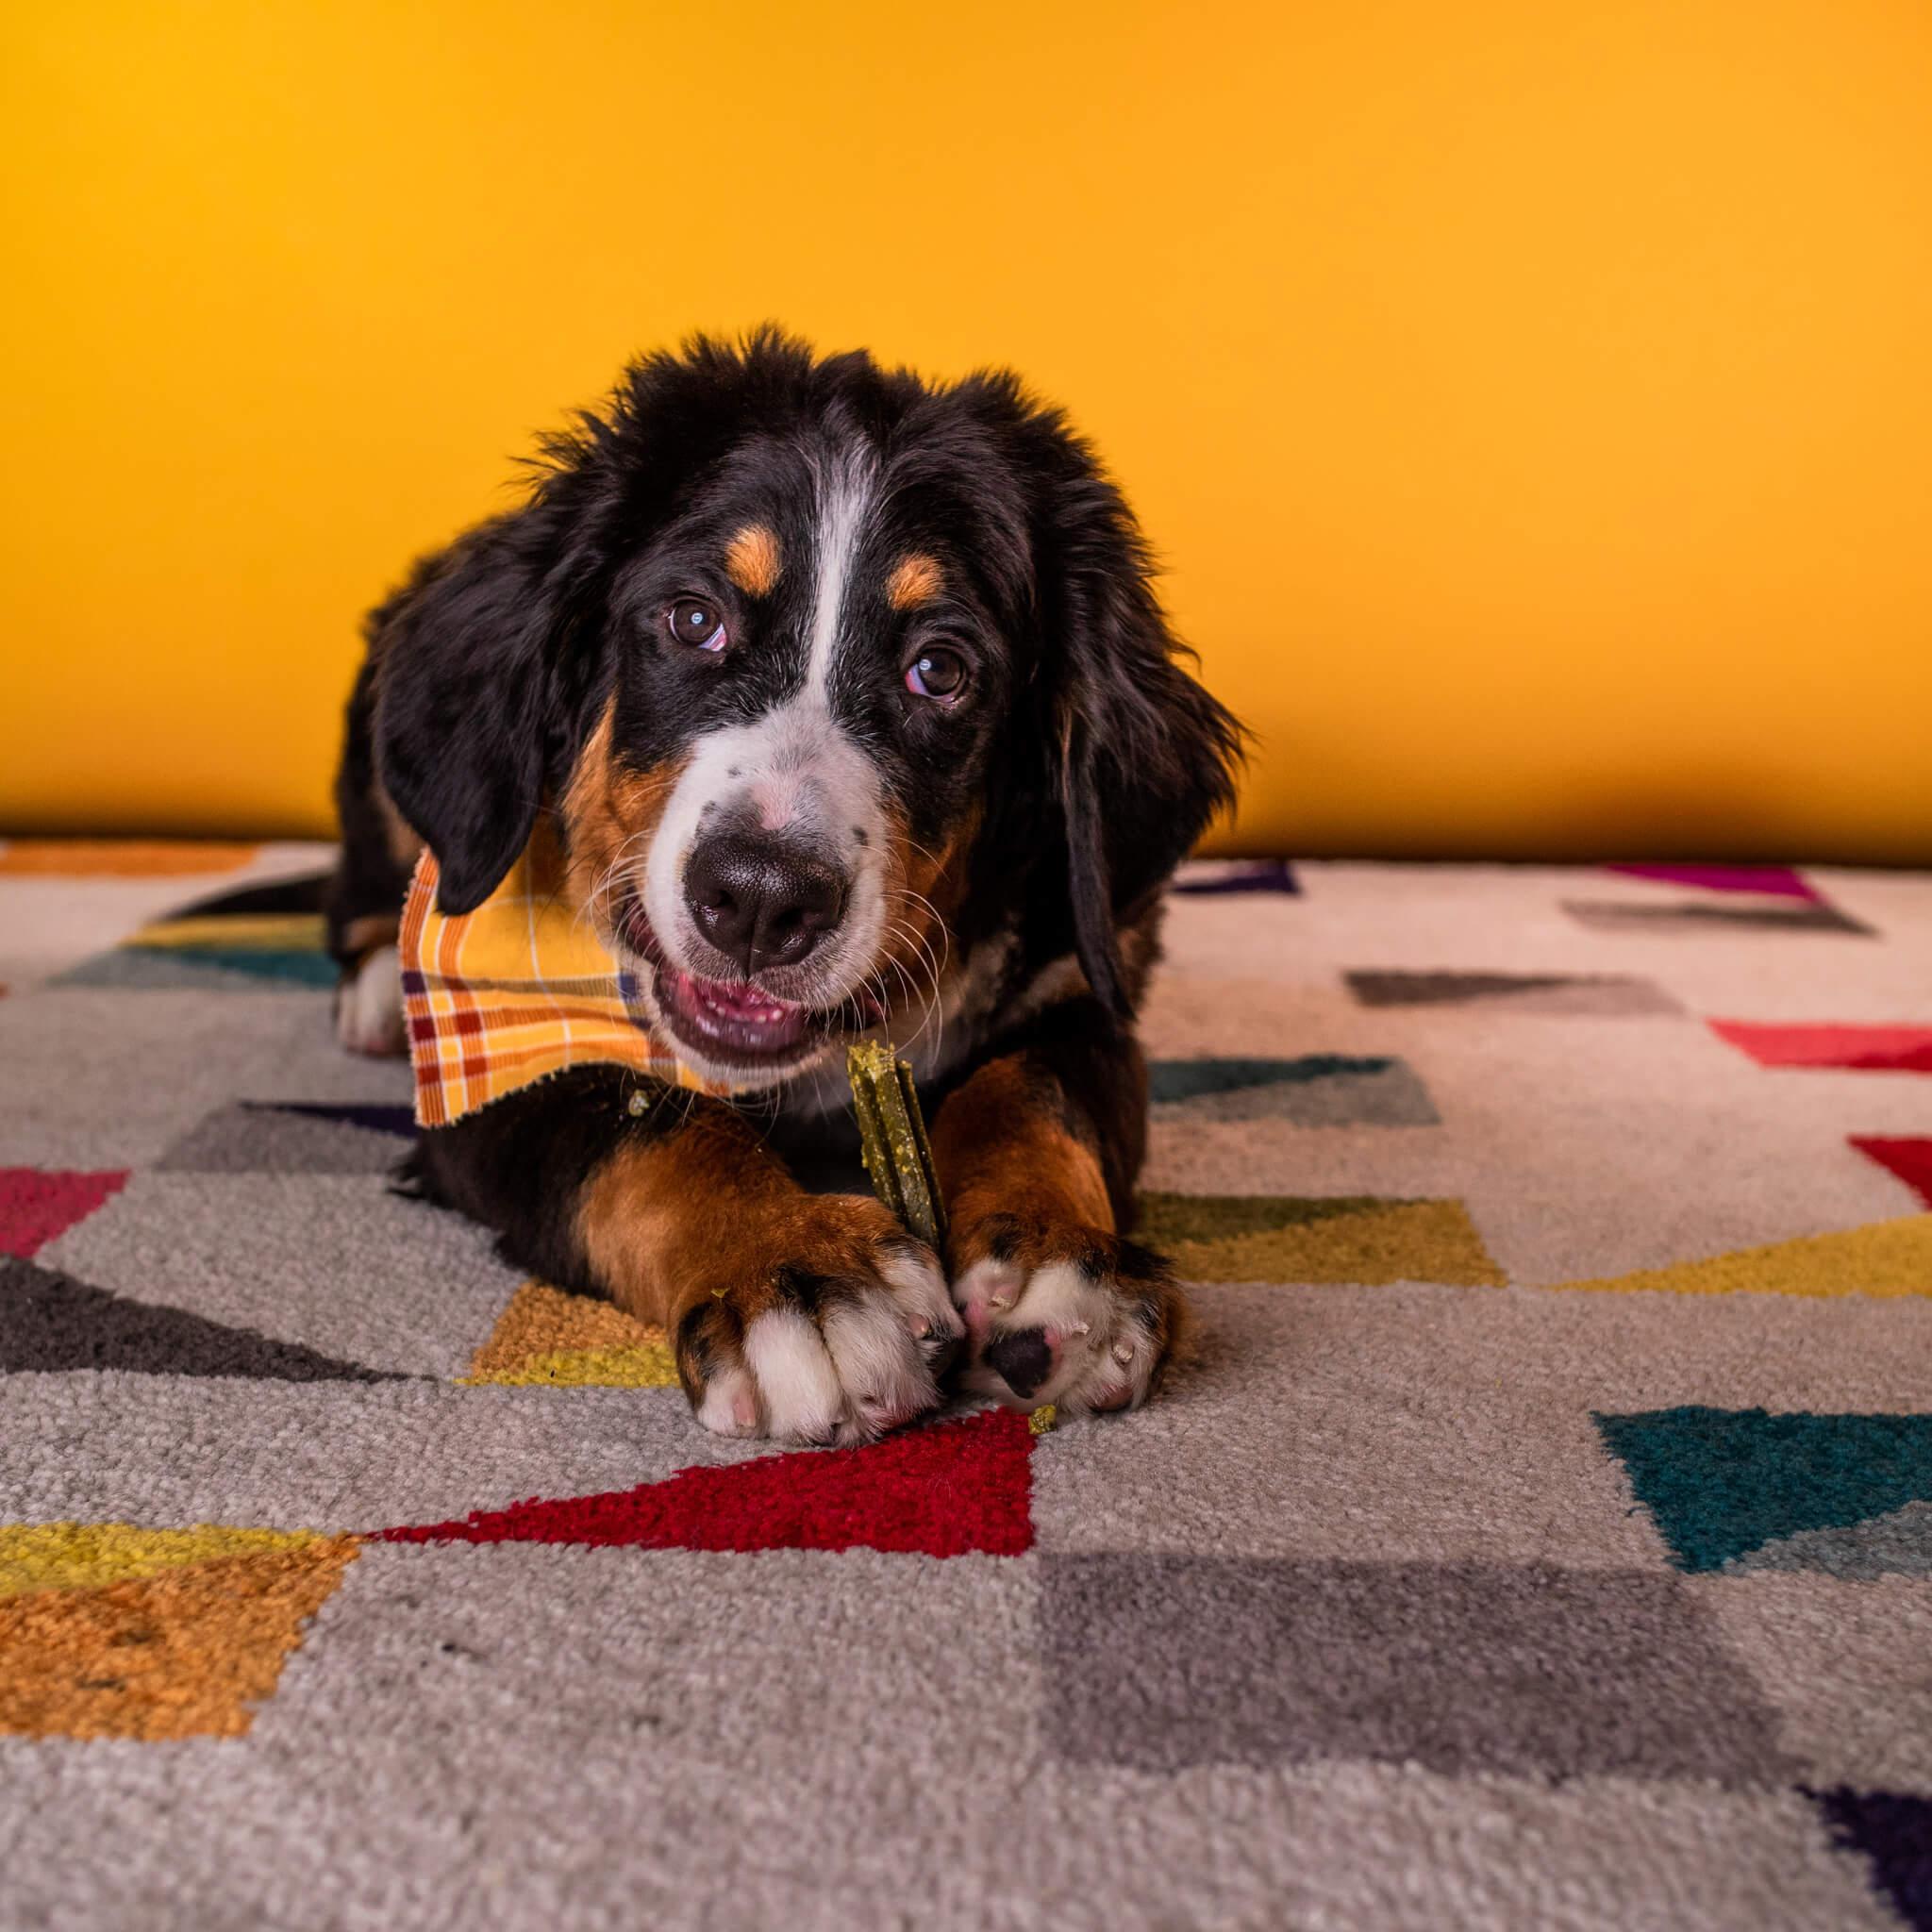 dog chewing on a dental chew stick | Pupford